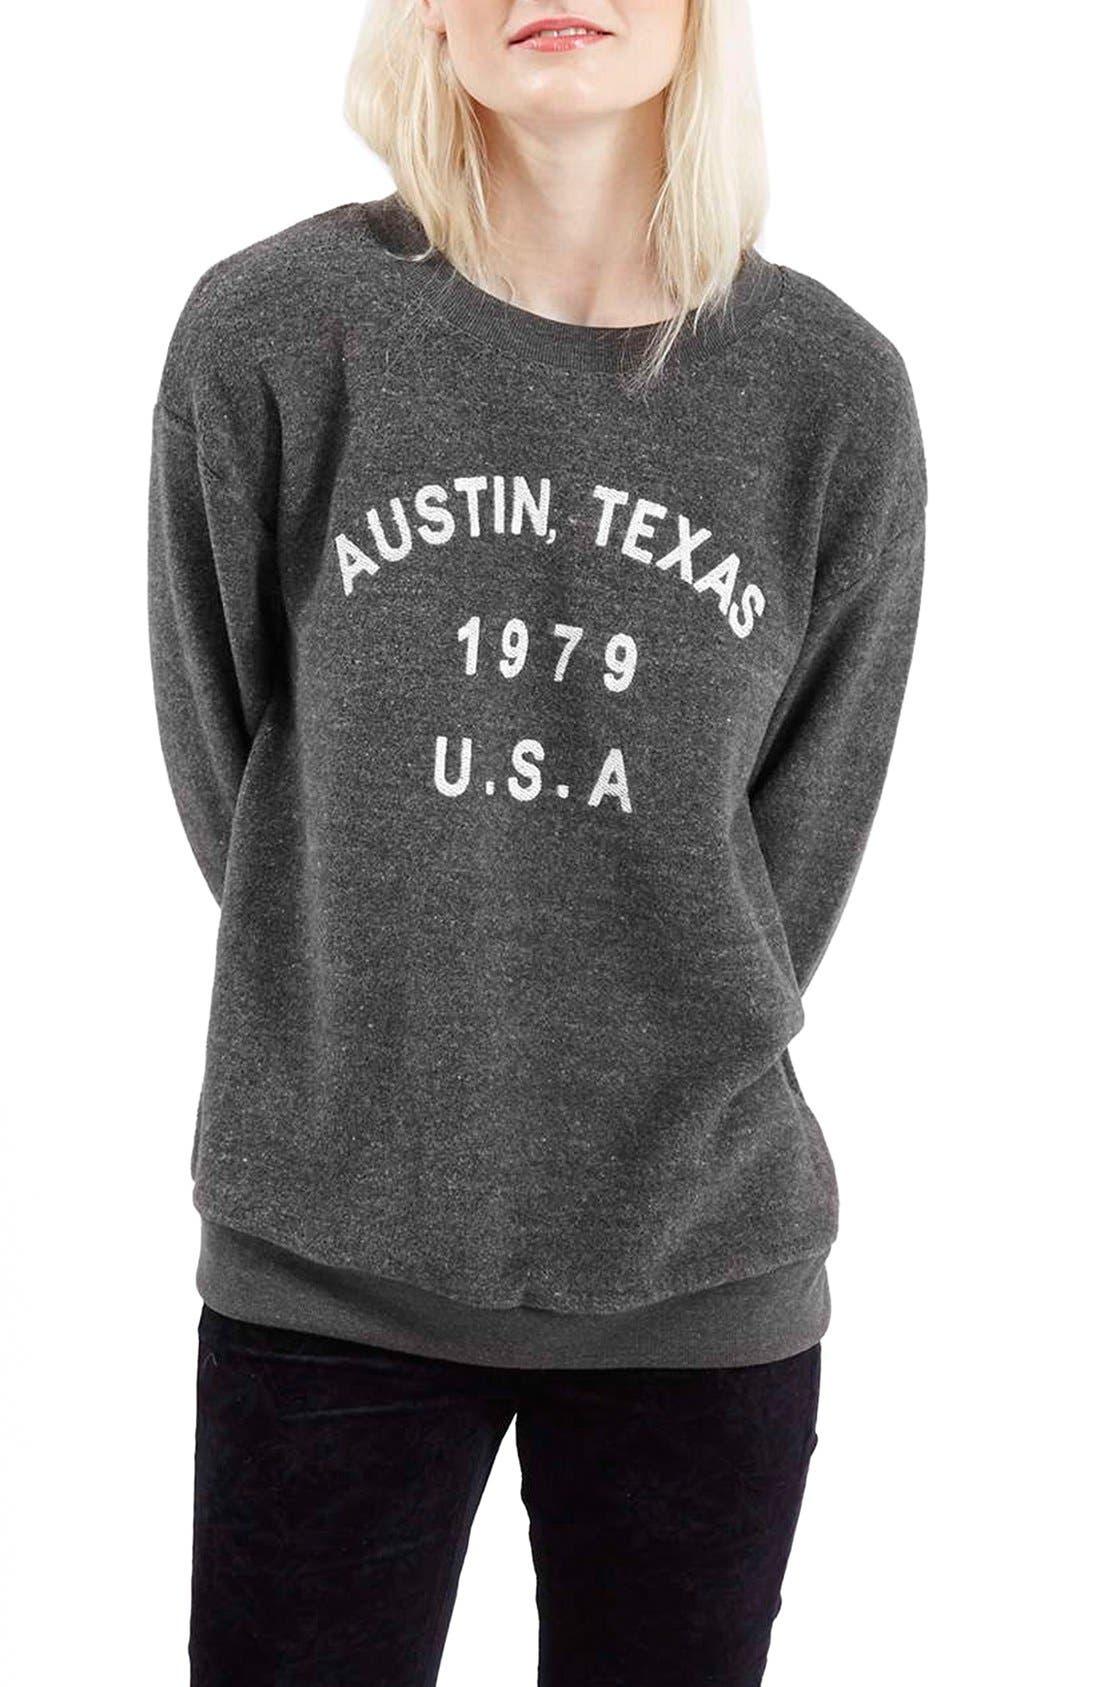 Main Image - Topshop 'Austin, Texas' Crewneck Sweatshirt